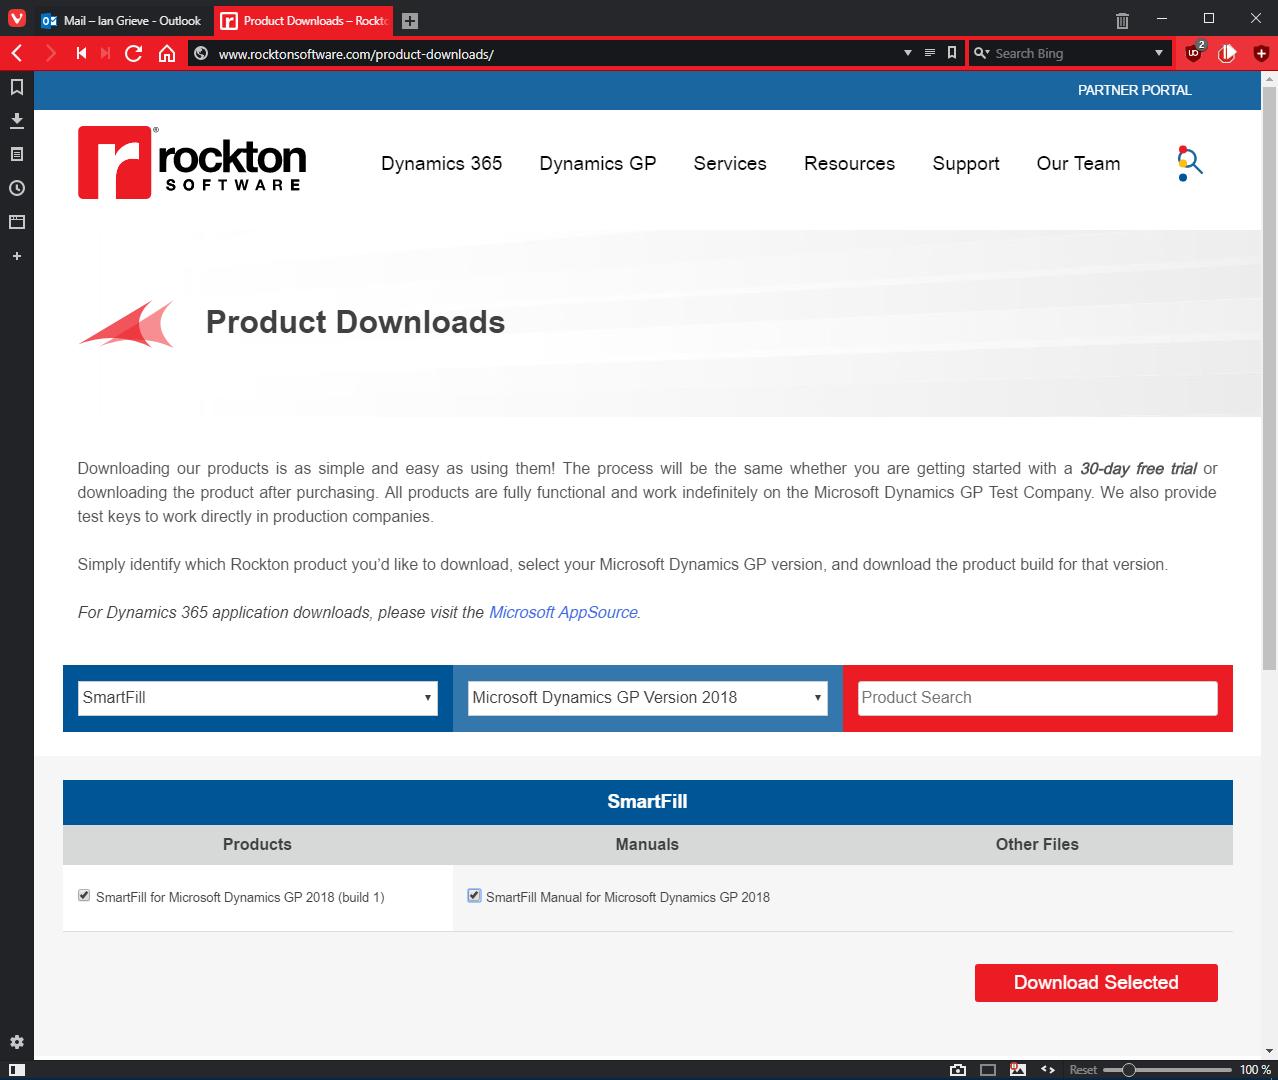 Rockton Software downloads page